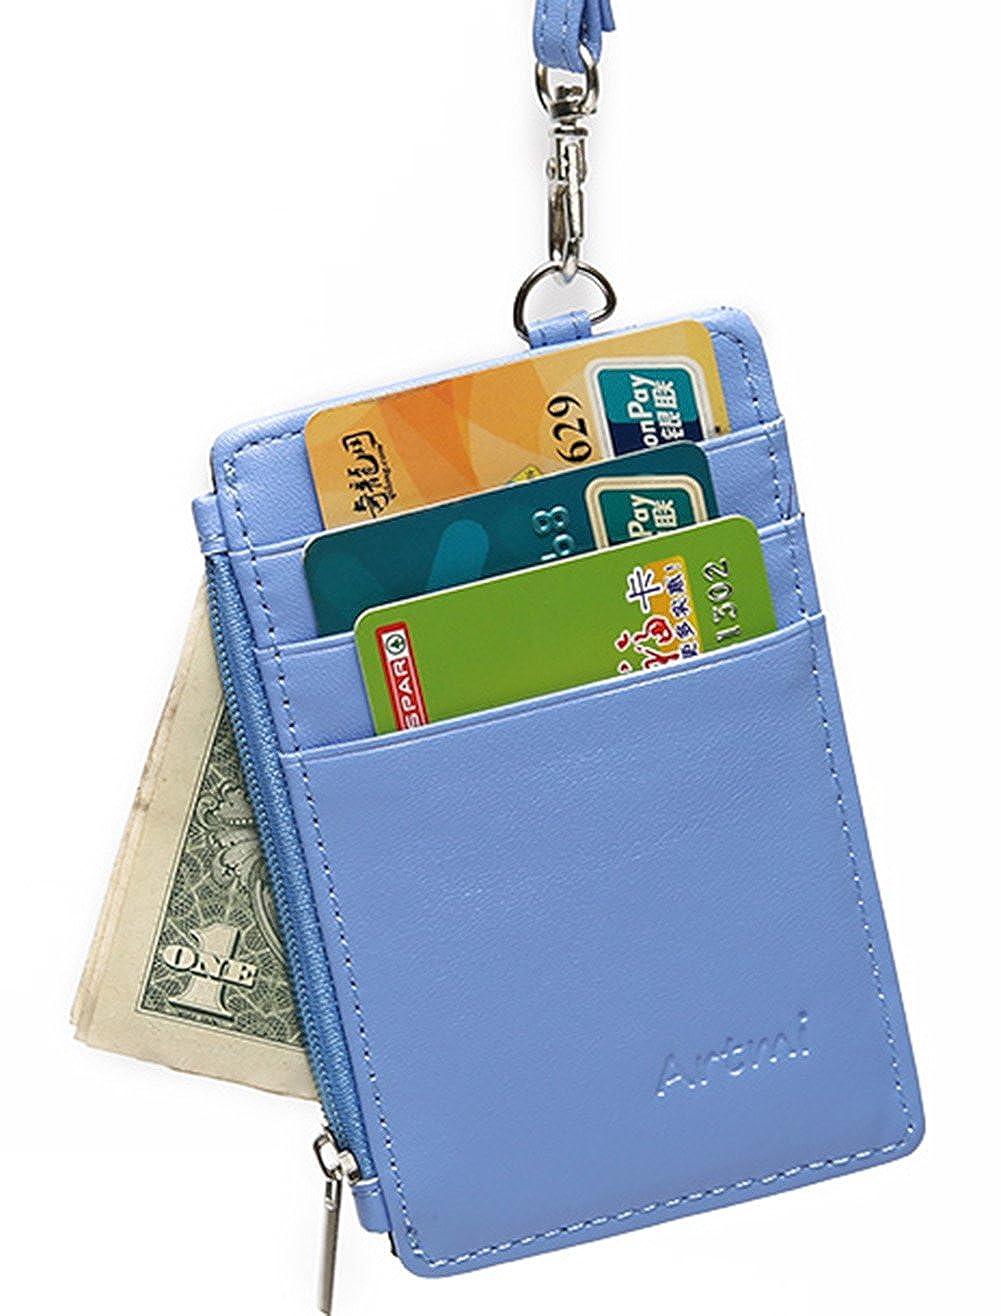 Women RFID Slim Credit Card Holder Id Card Case Holder Purse with Neck Strap C013